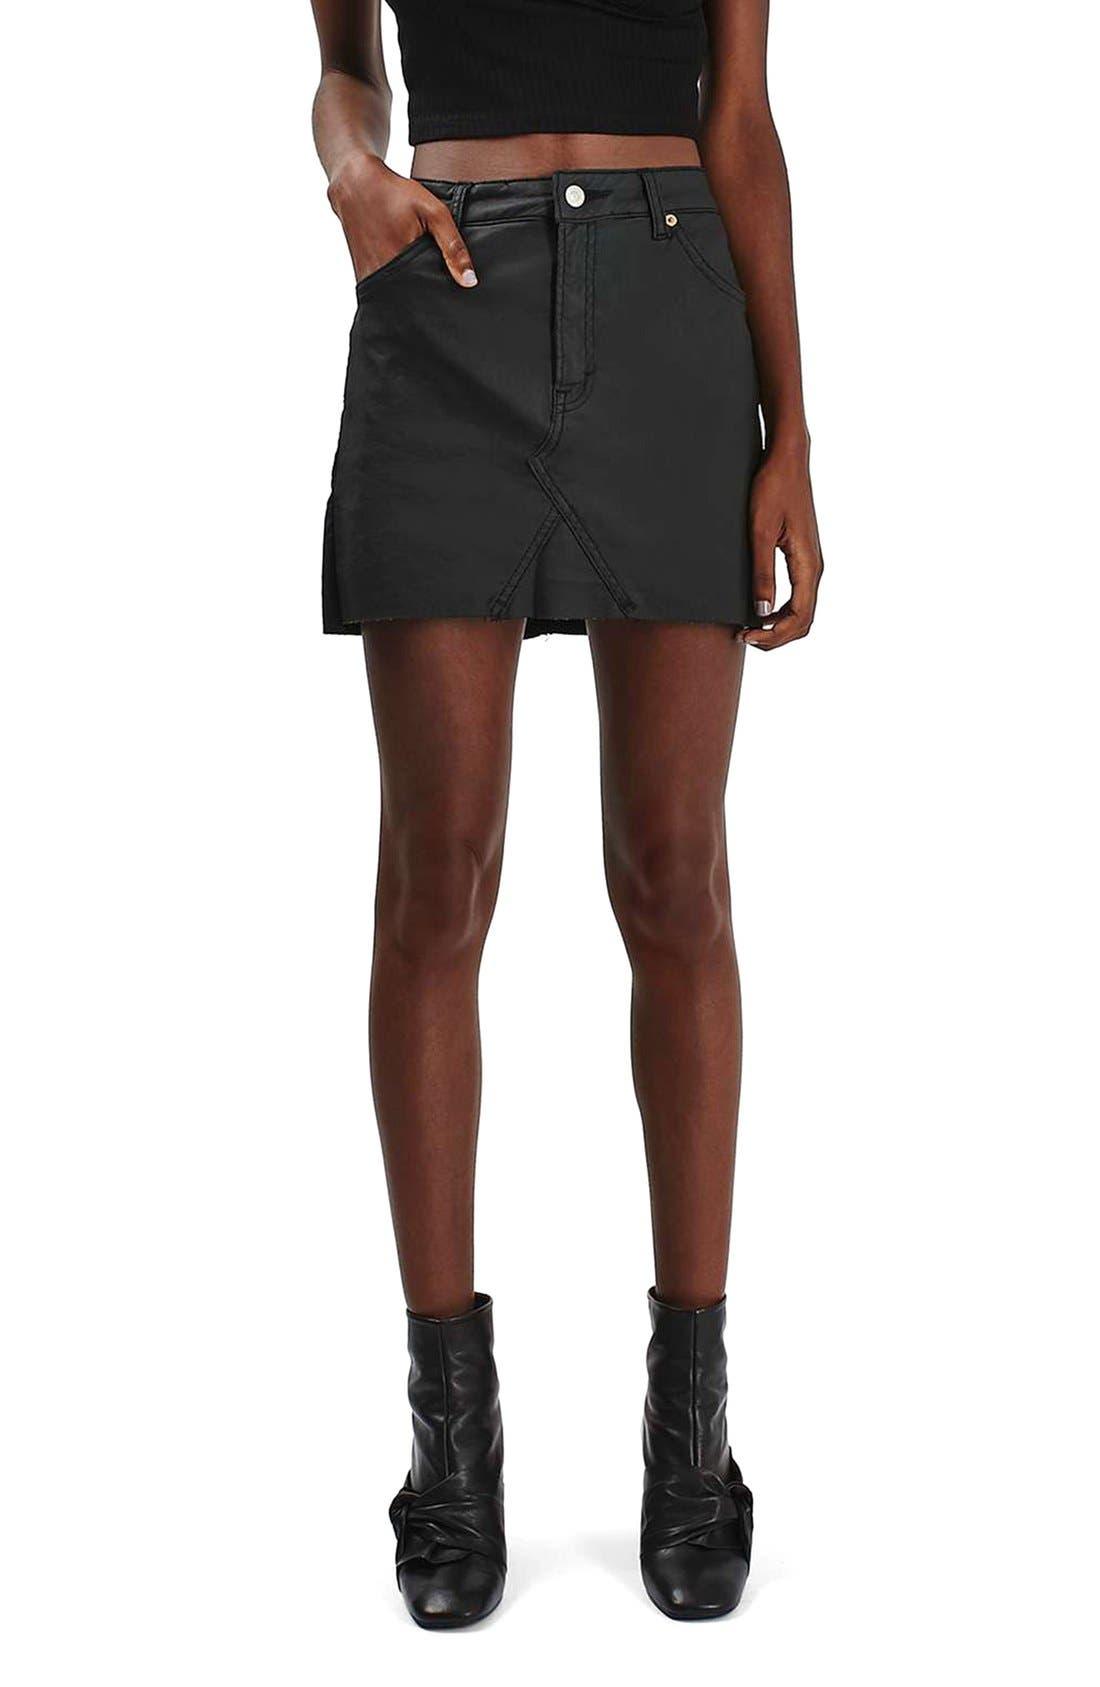 Alternate Image 1 Selected - Topshop Coated Stretch Denim Miniskirt